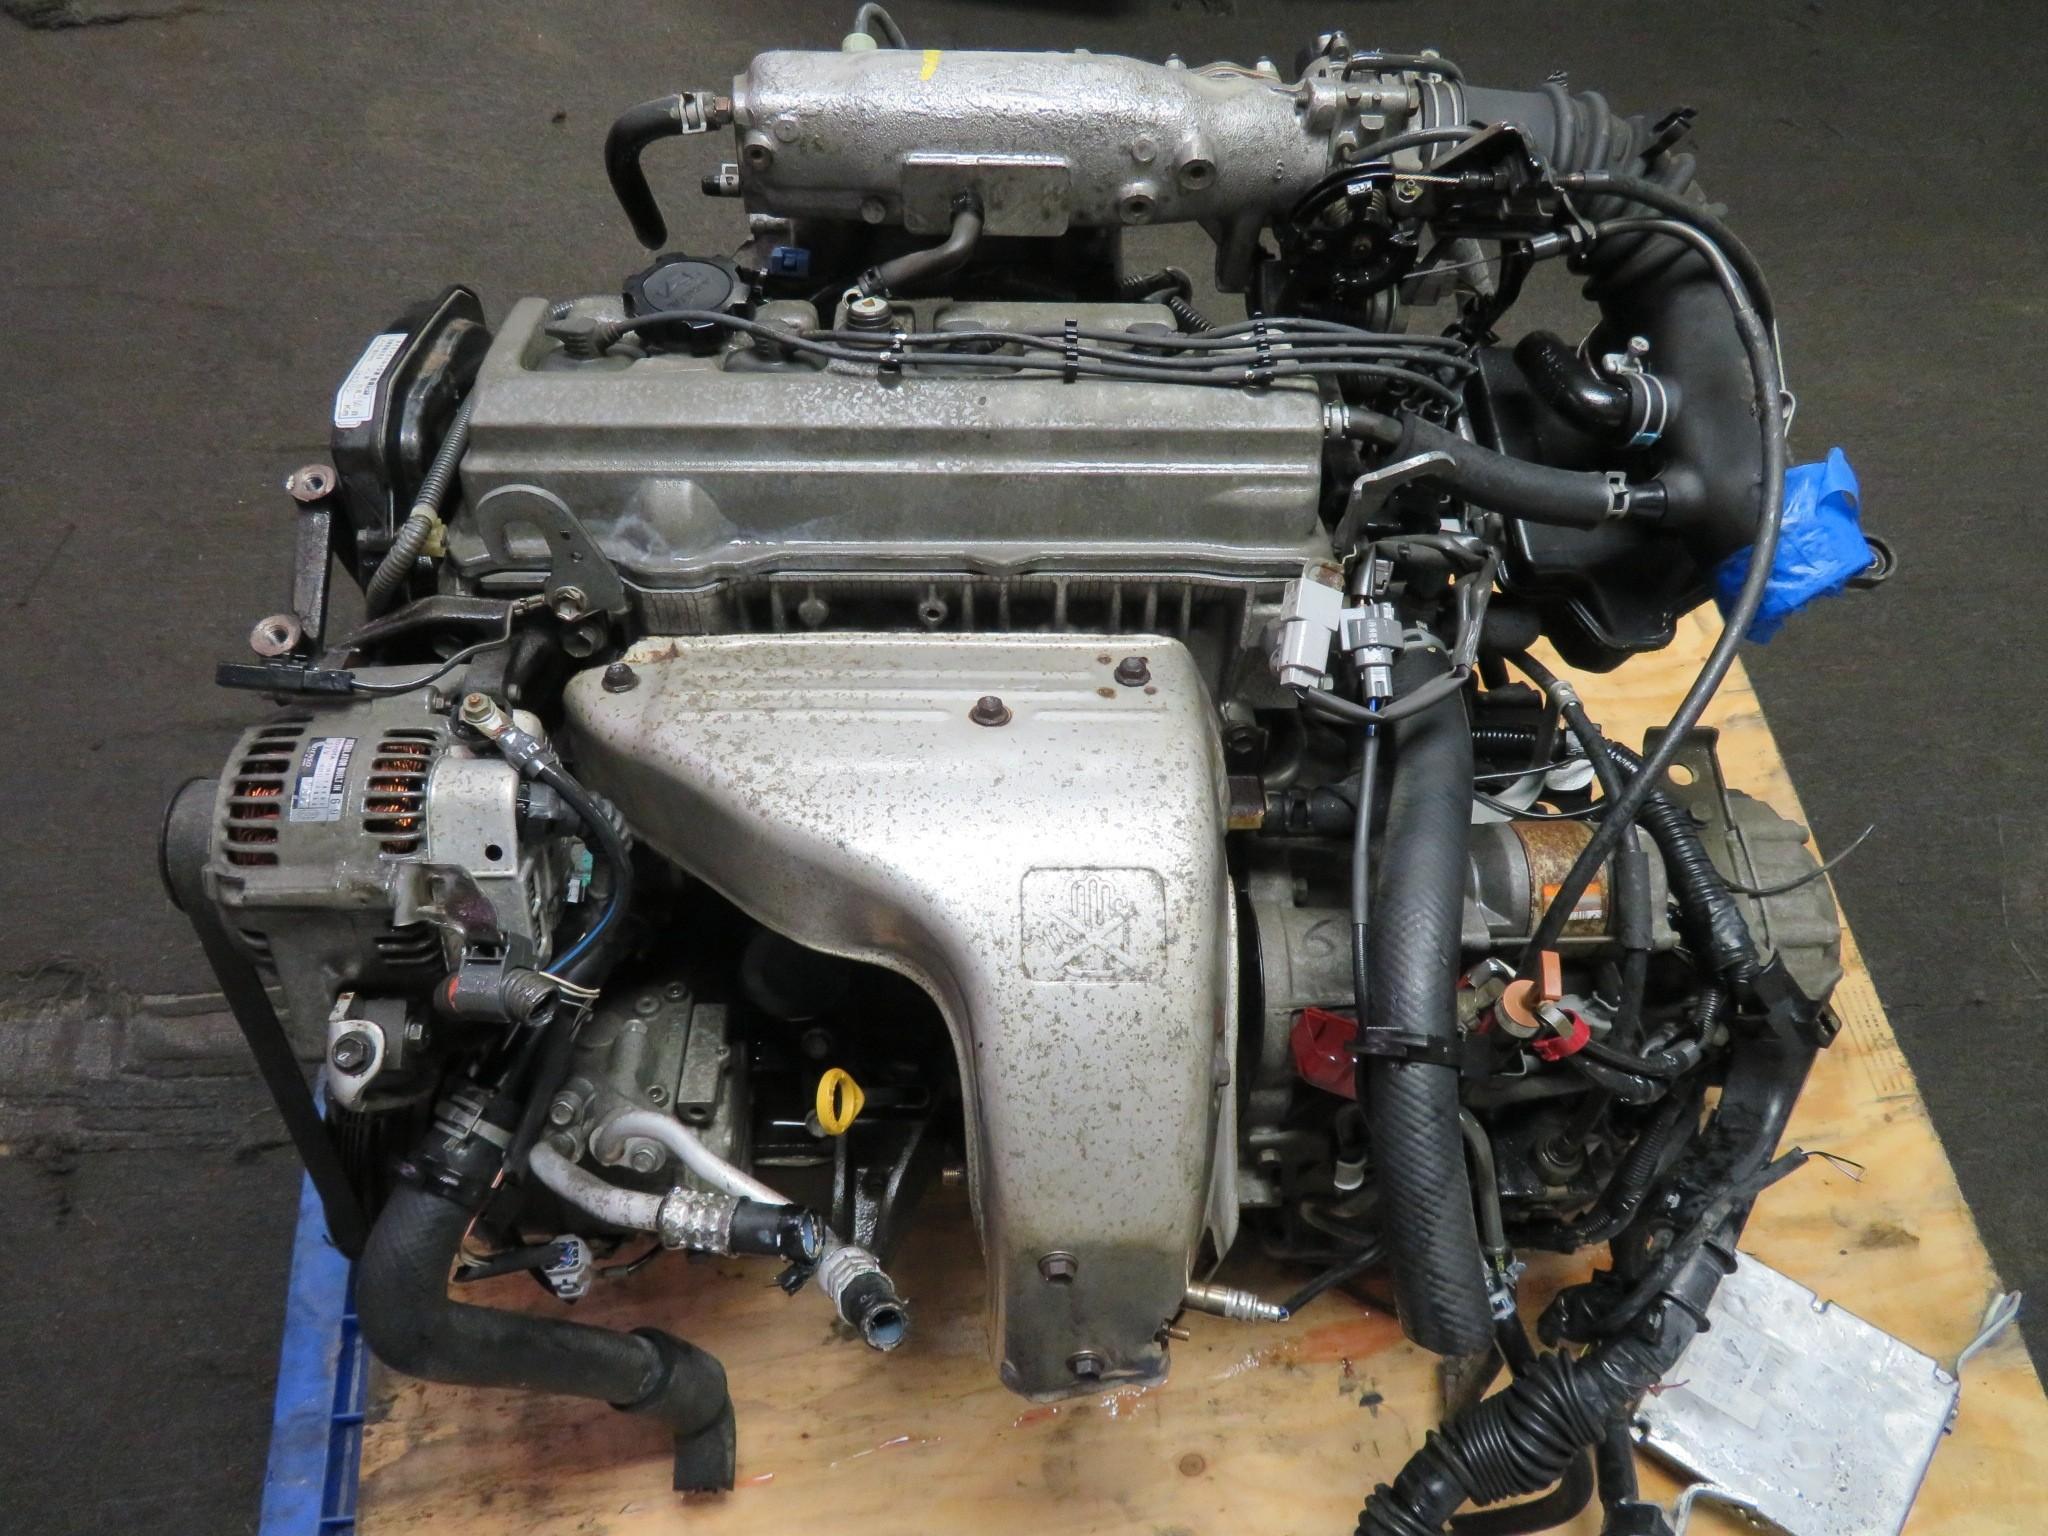 97-01 JDM TOYOTA CAMRY 5S-FE 2.2L ENGINE & AUTOMATIC TRANSMISSION